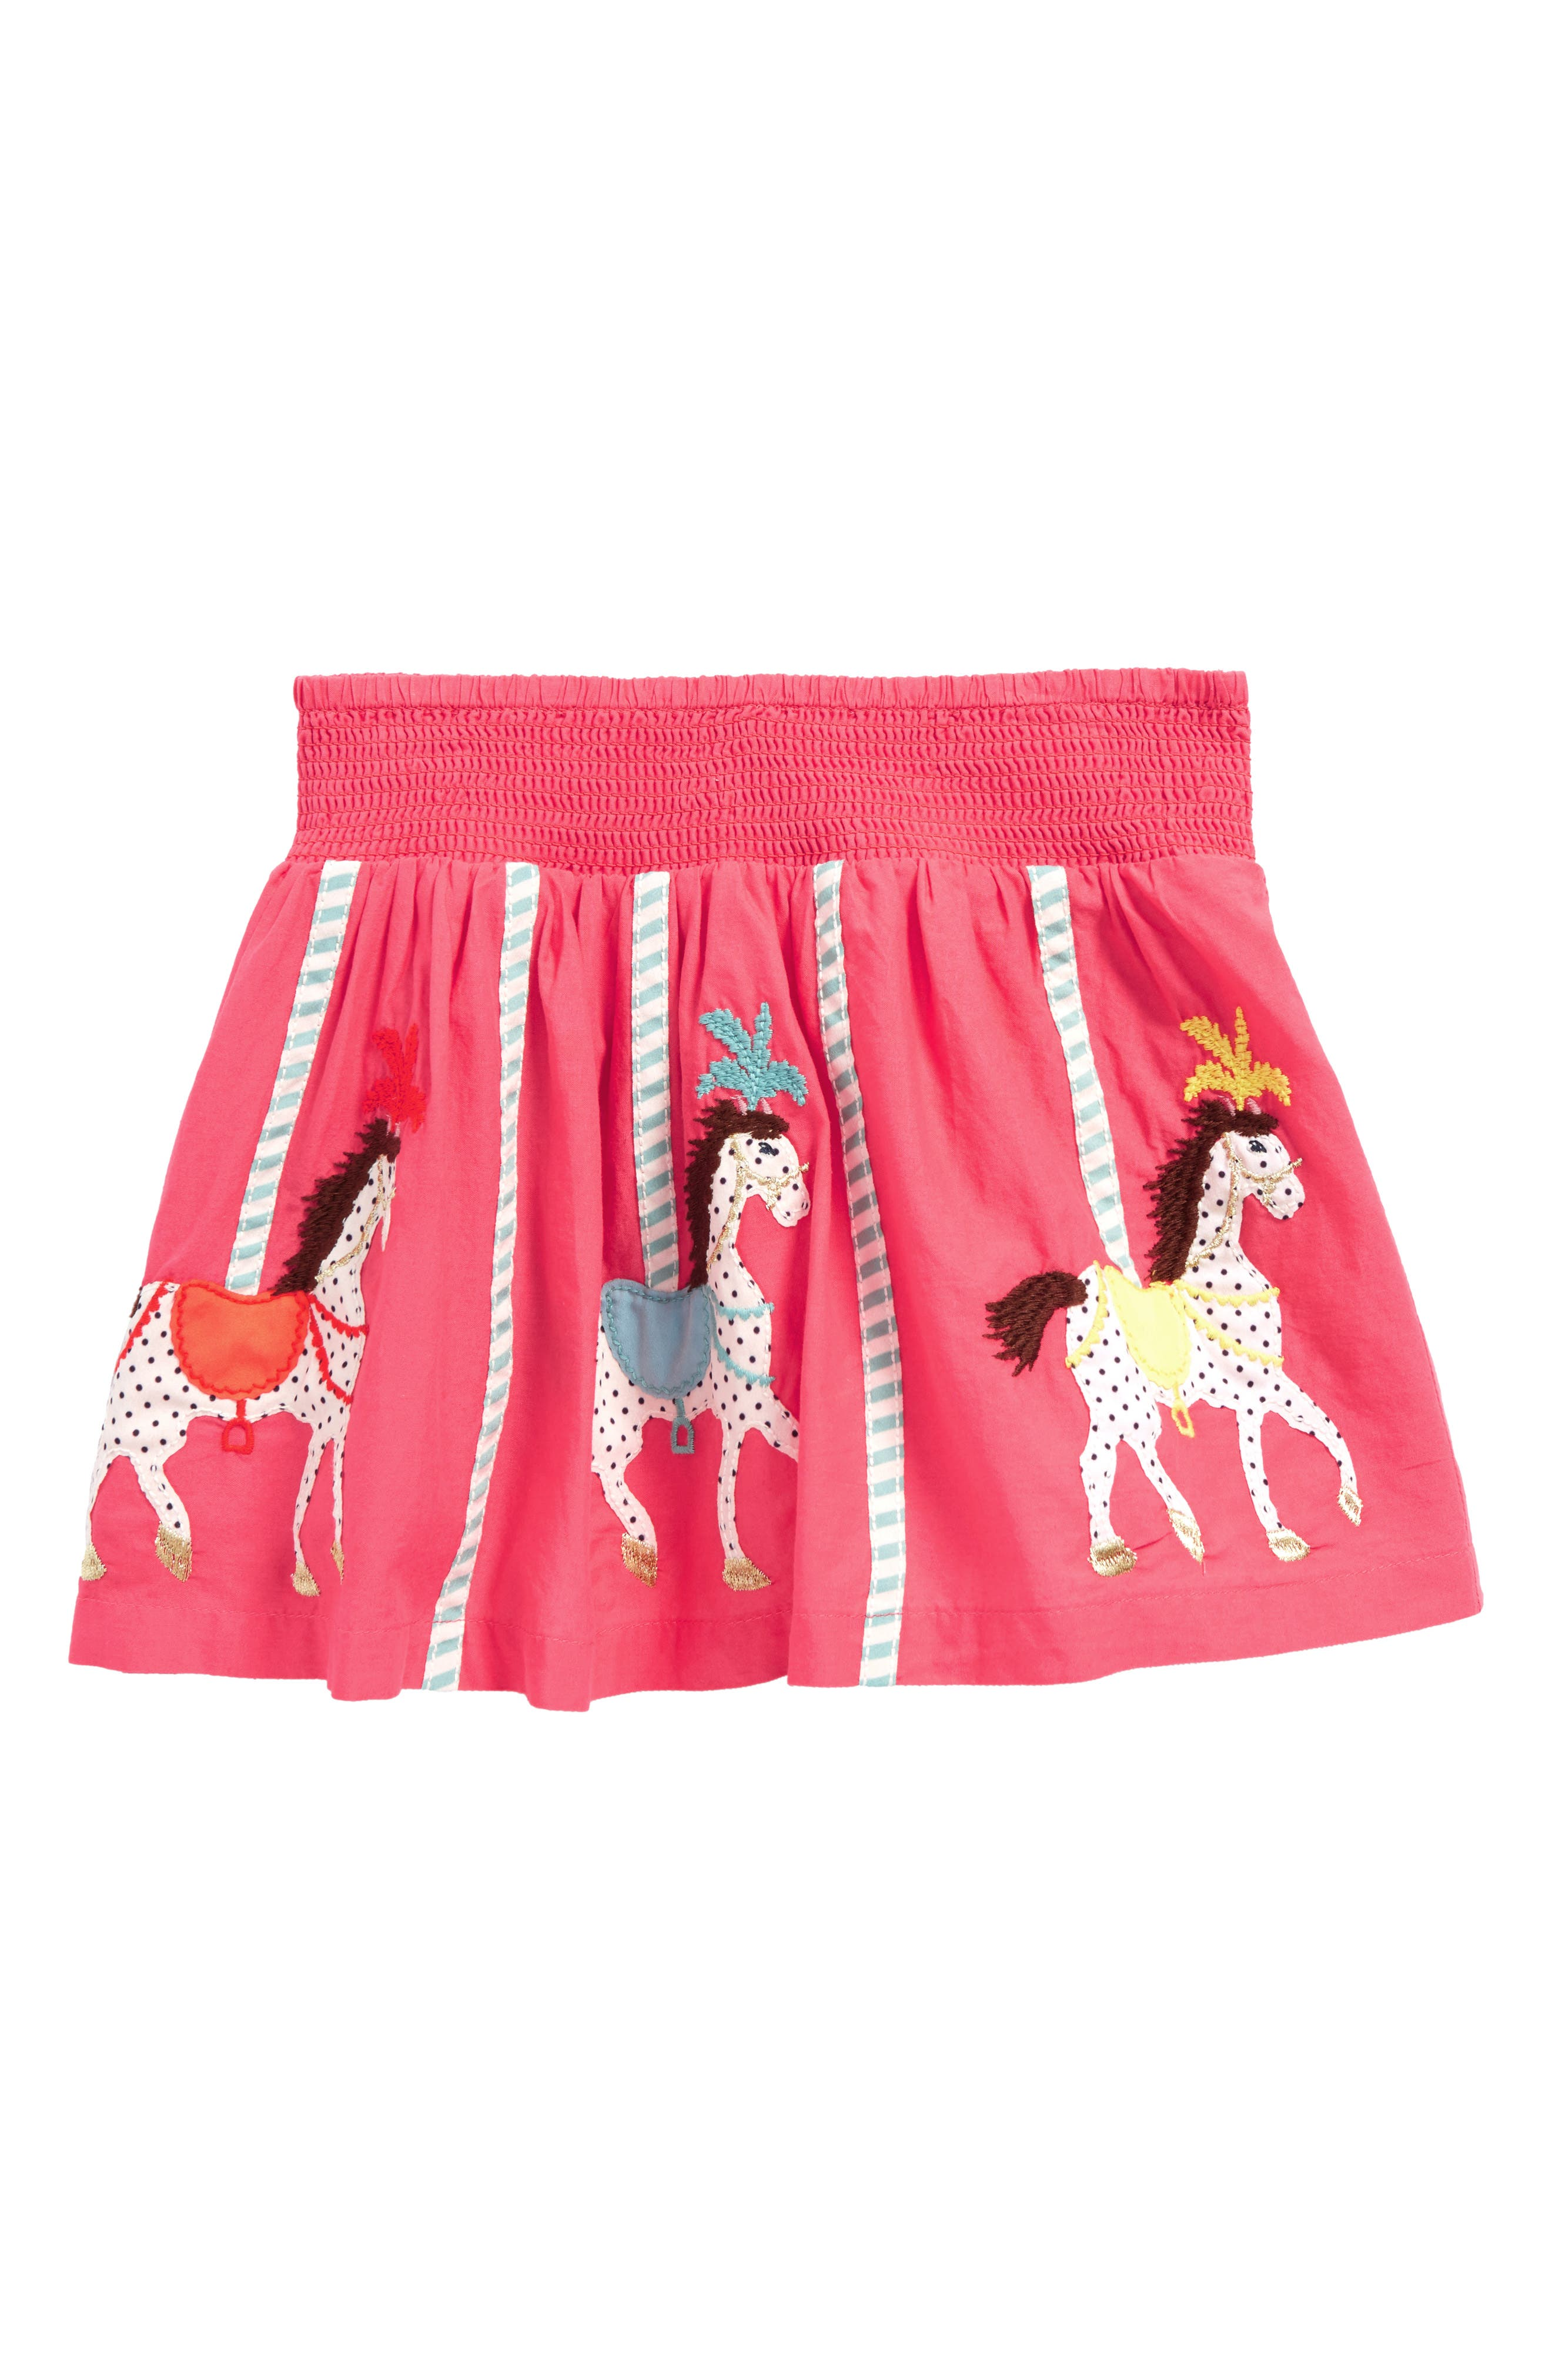 Colorful Appliqué Skirt,                             Main thumbnail 1, color,                             Provence Dusty Pink Horses Pnk